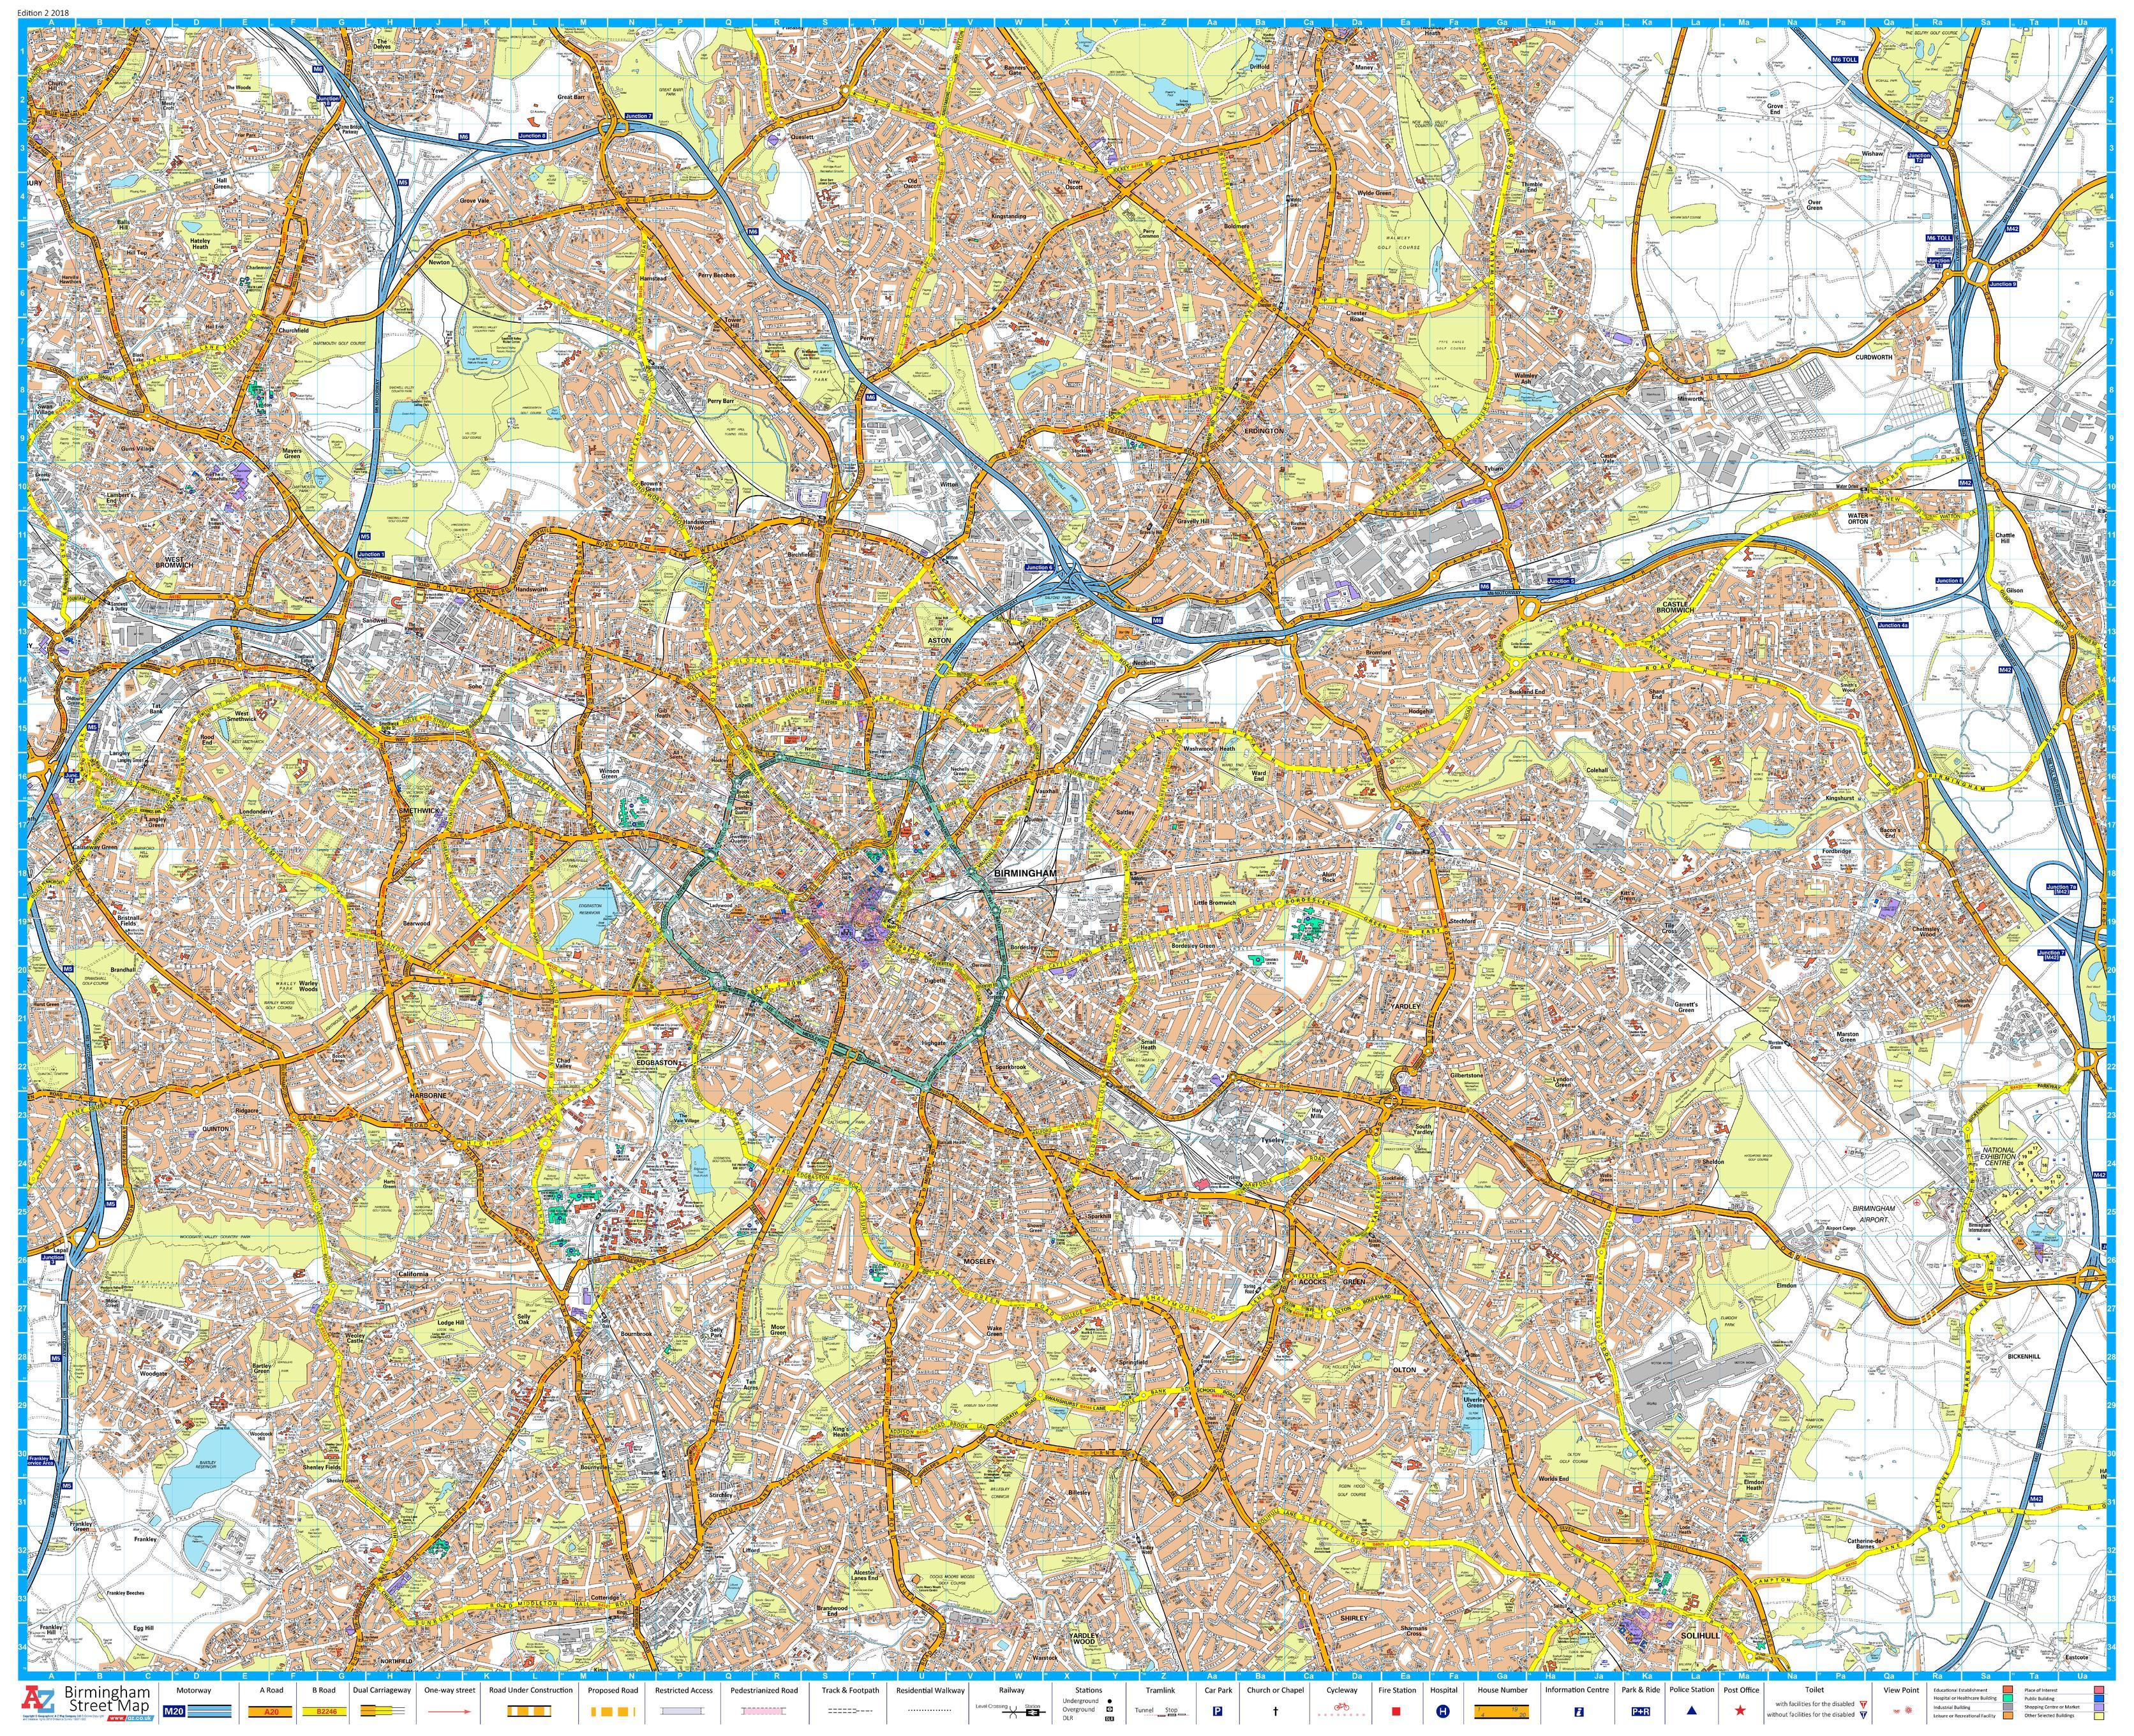 A-Z Birmingham Street Map